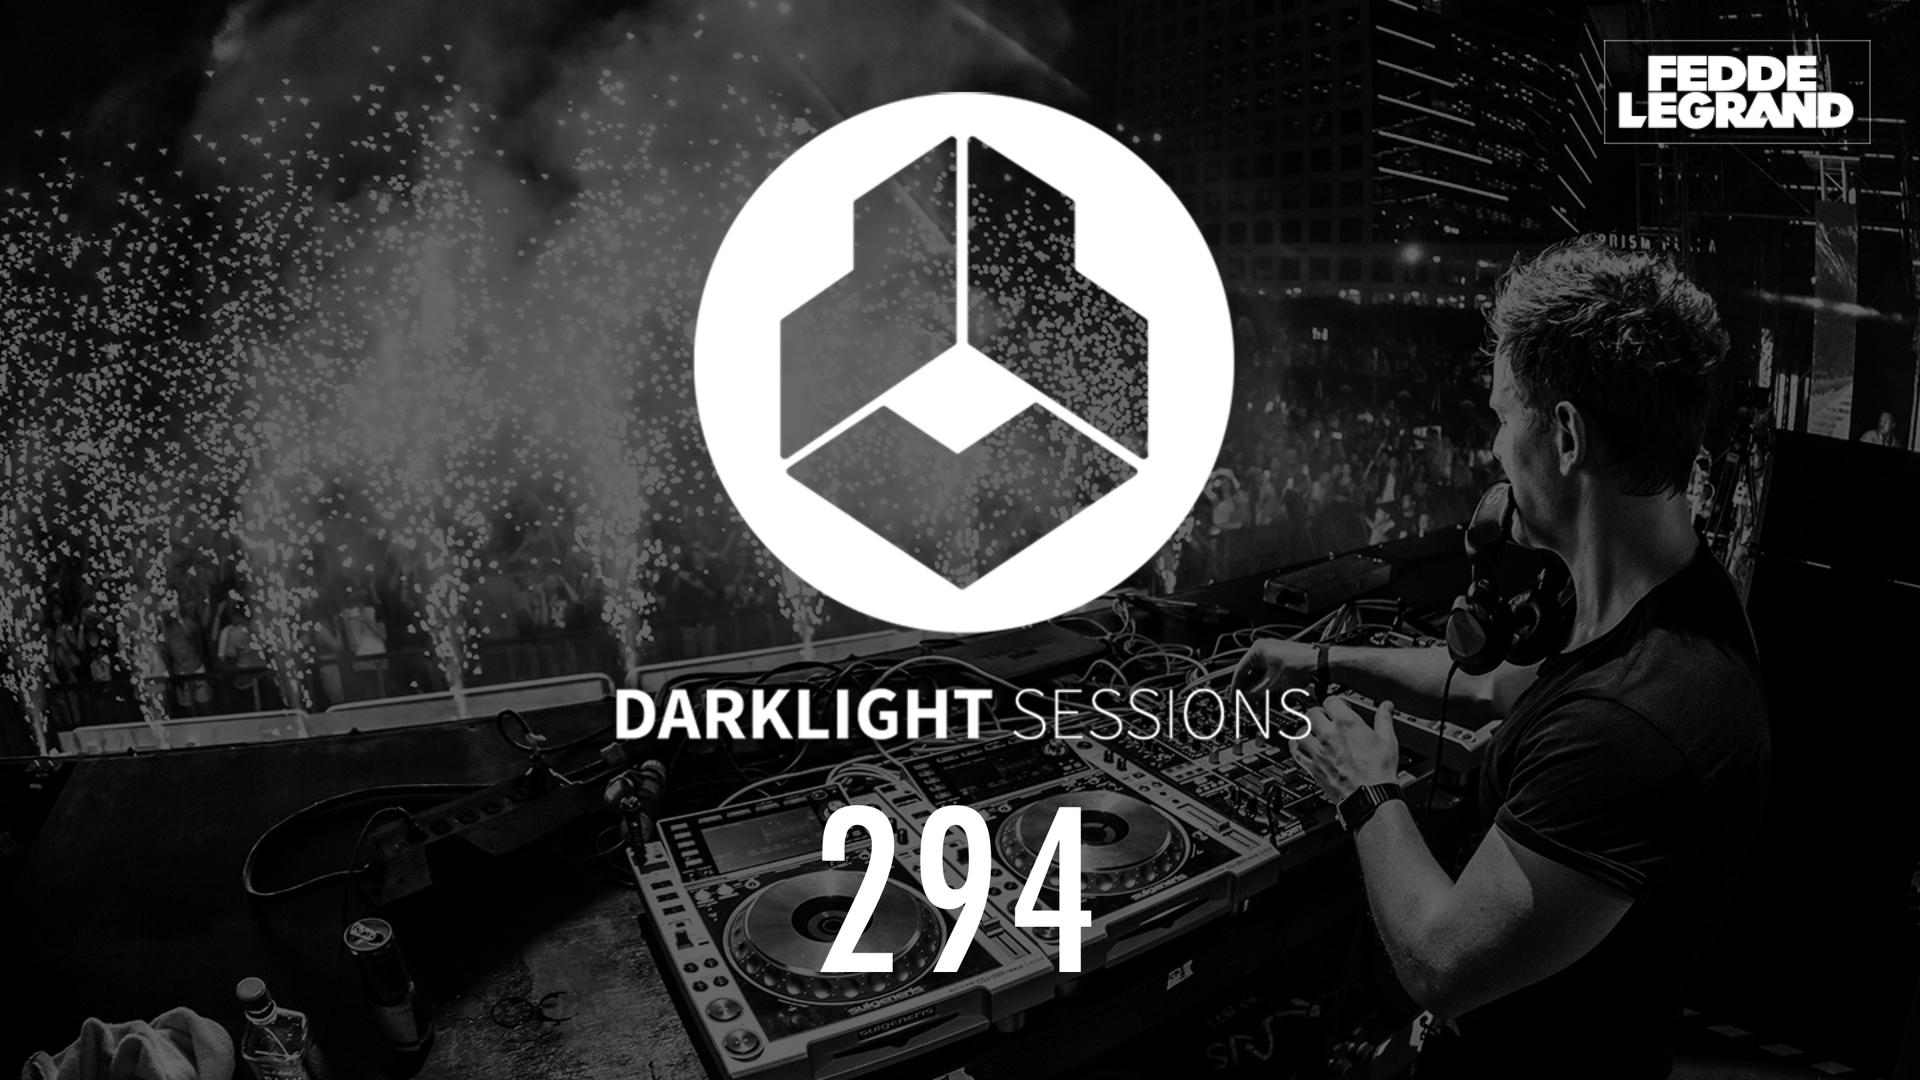 Darklight Sessions 294